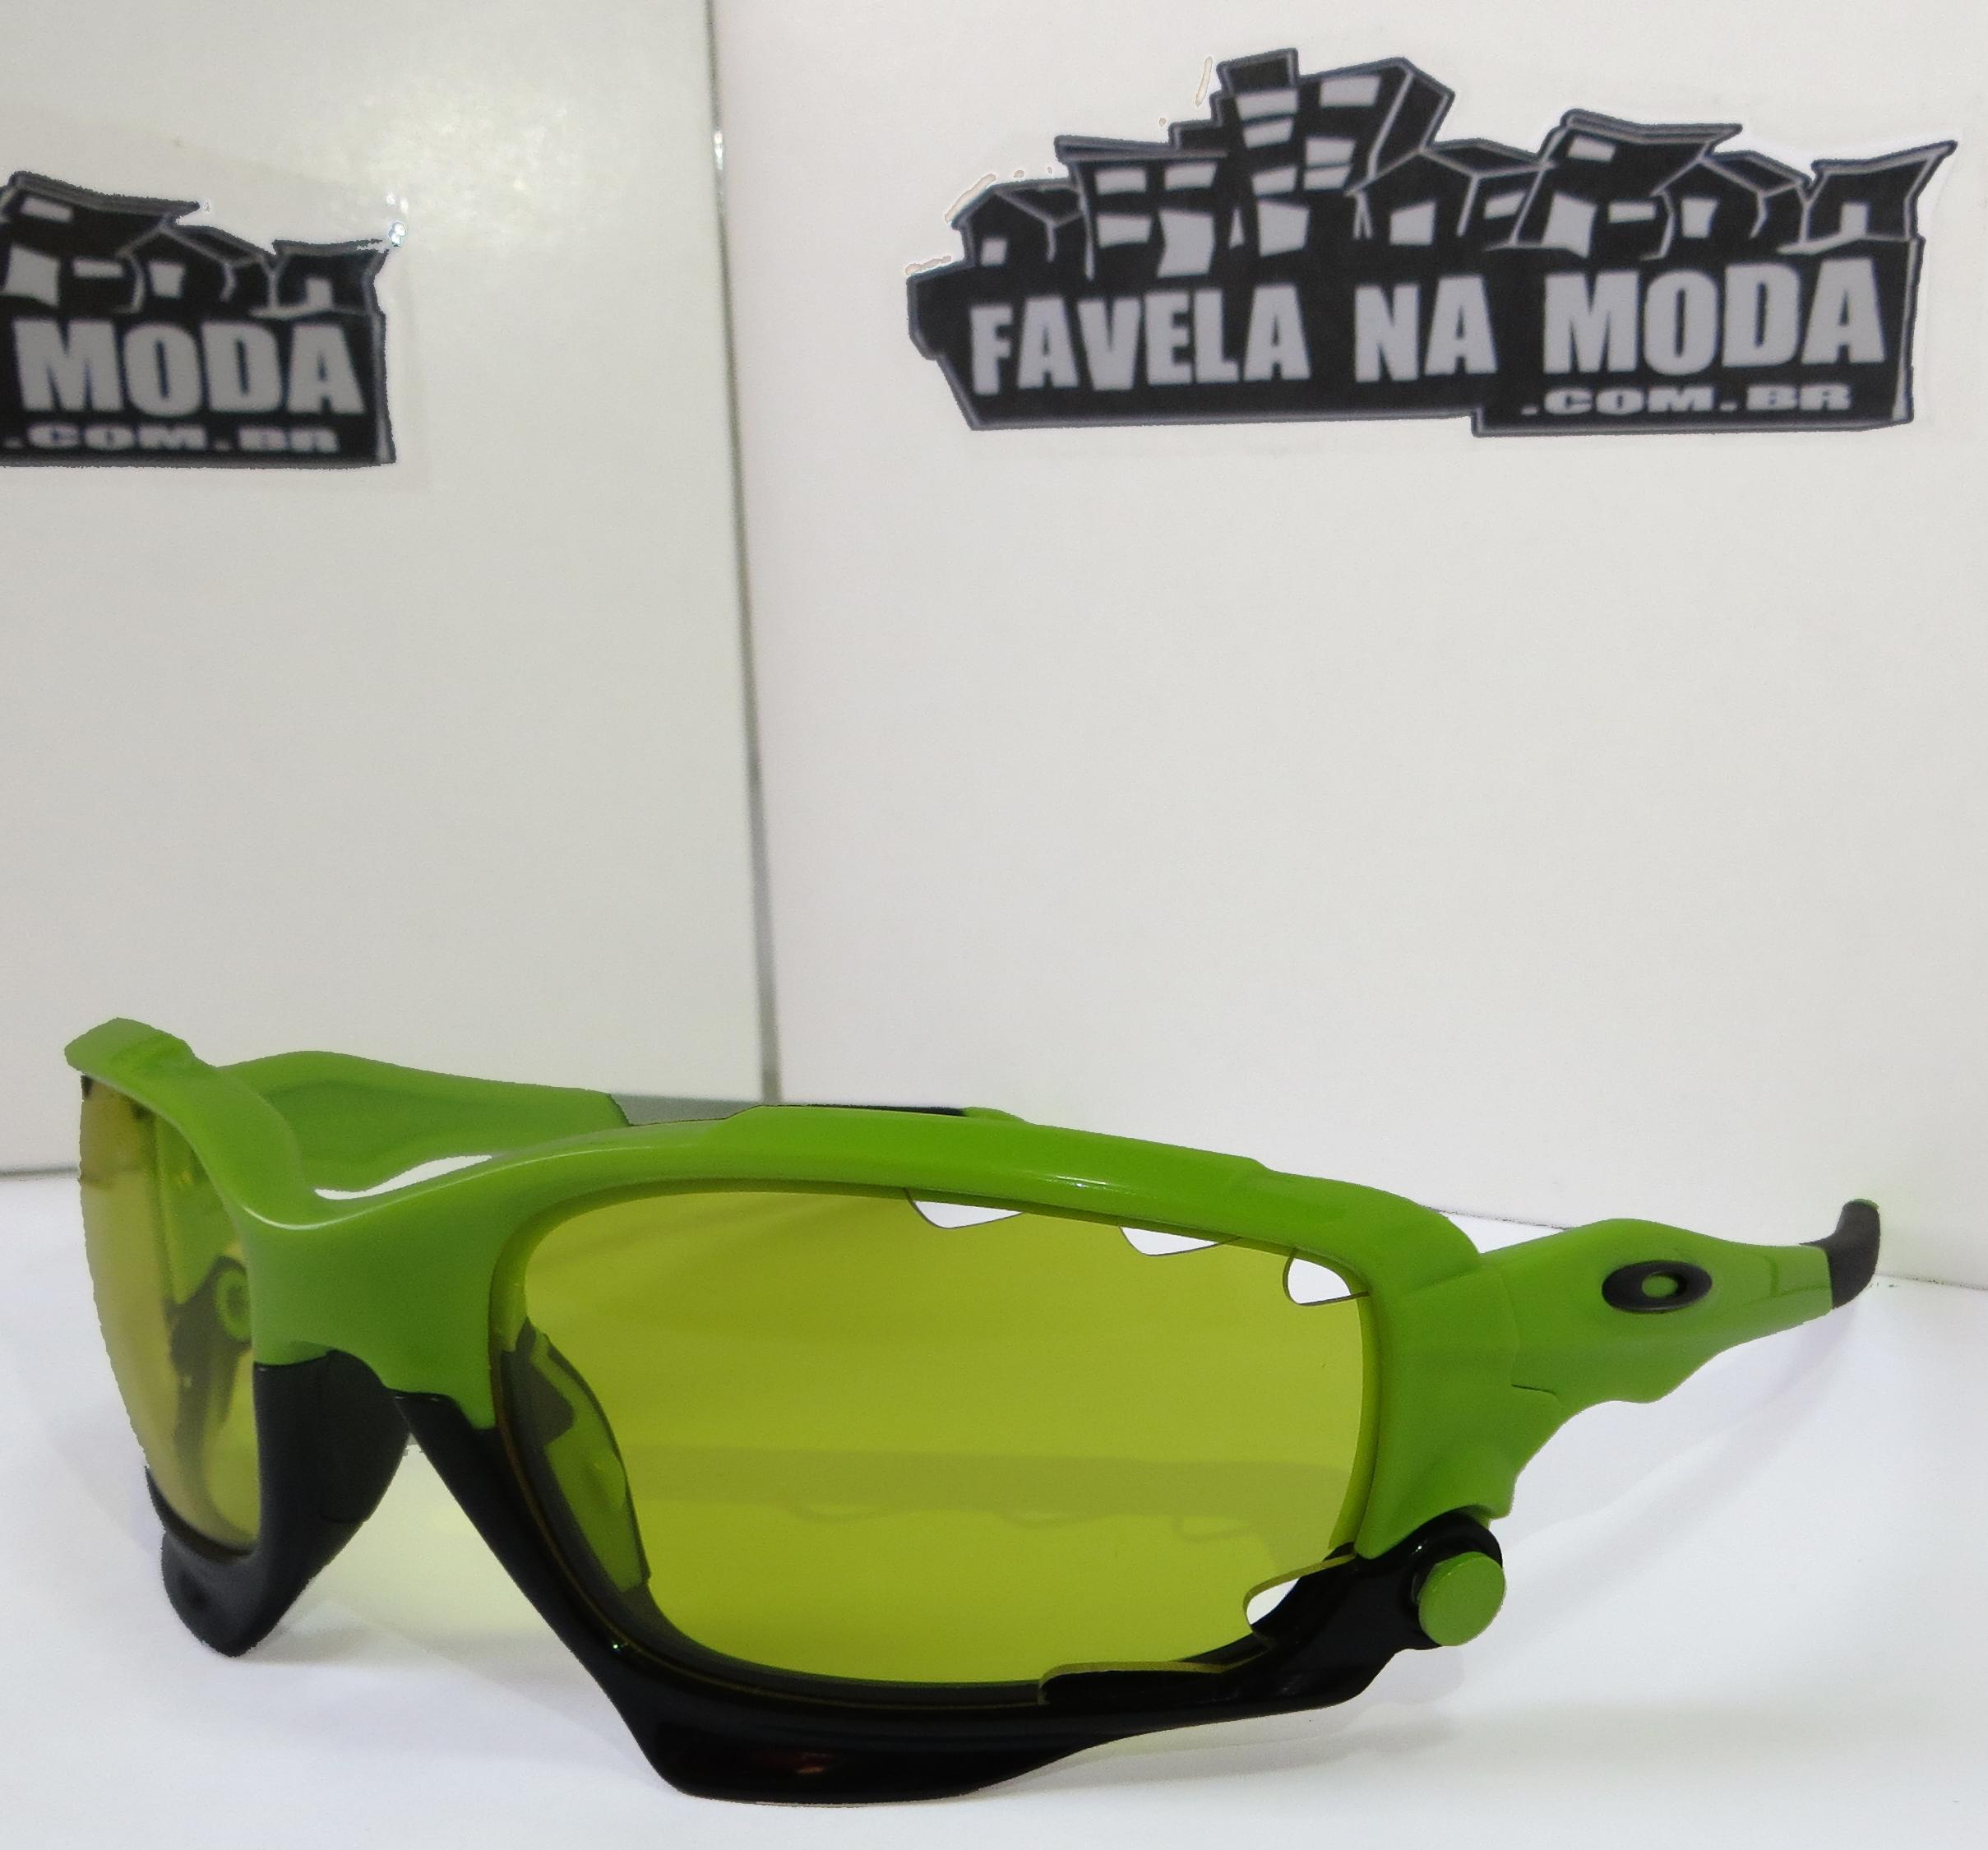 0ced8052c669d Óculos Oakley Jawbone - Verde   Preto - Favela na Moda Imports